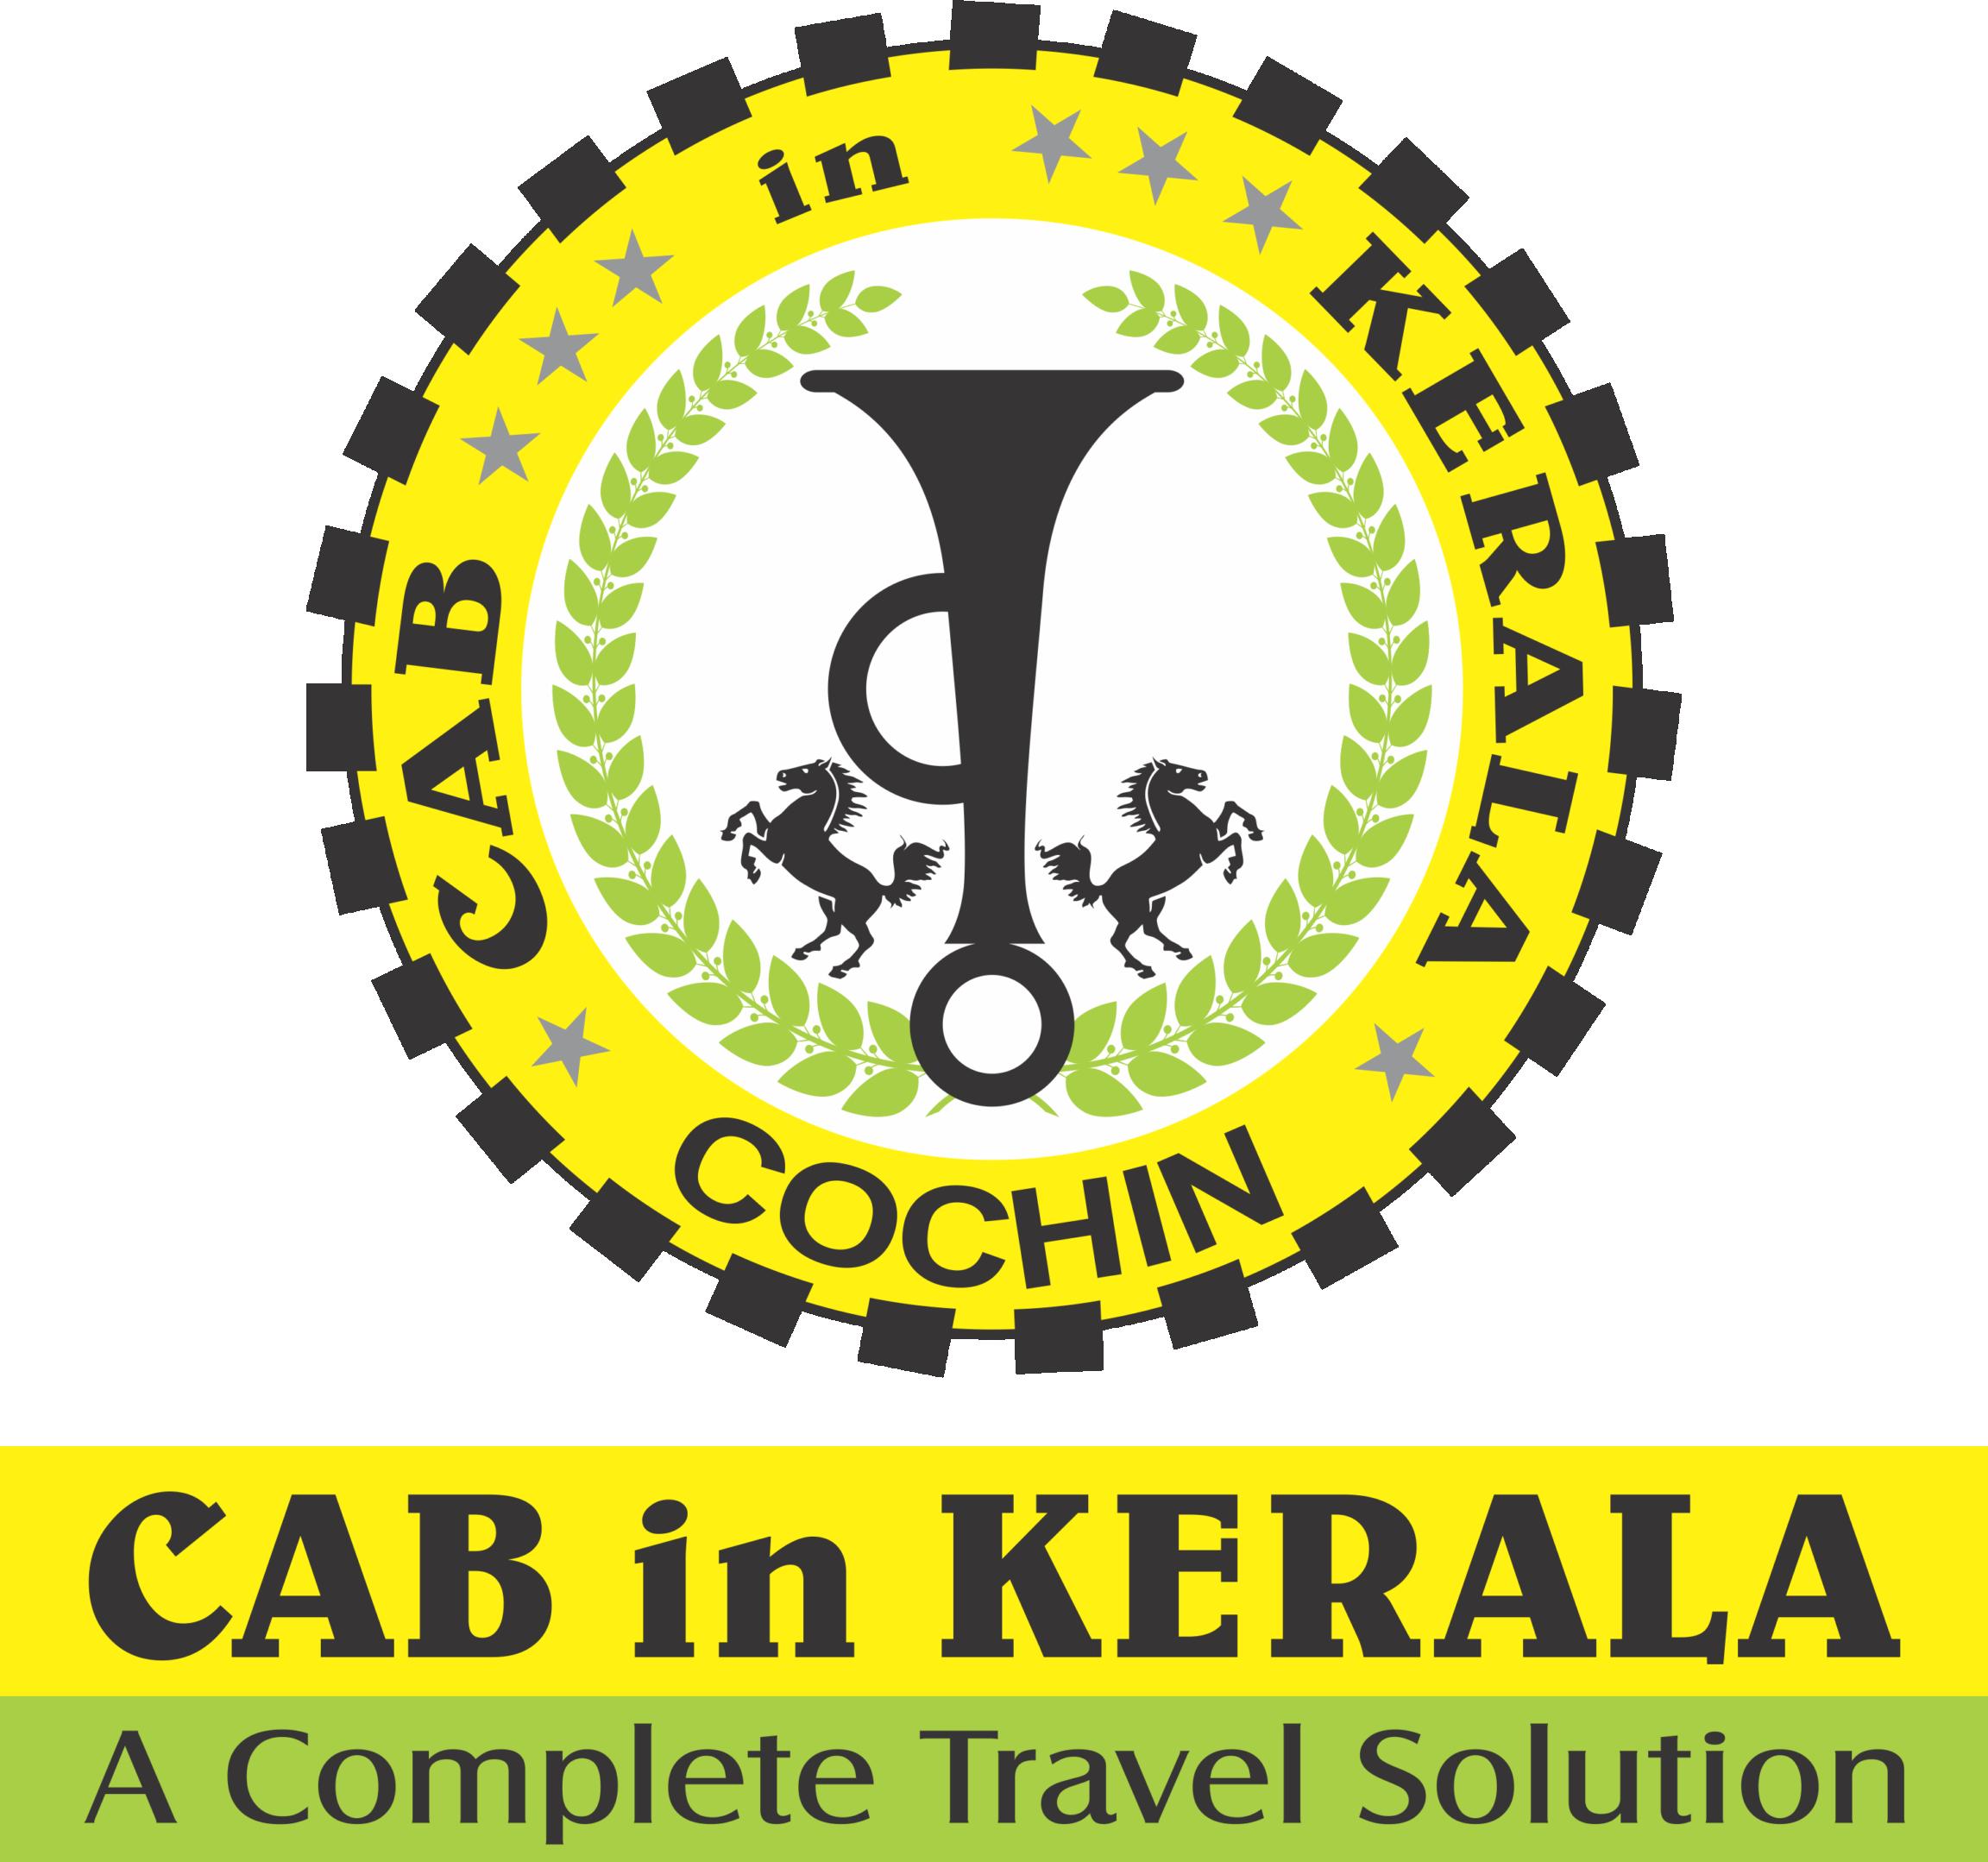 Cab in Kerala Taxi Service